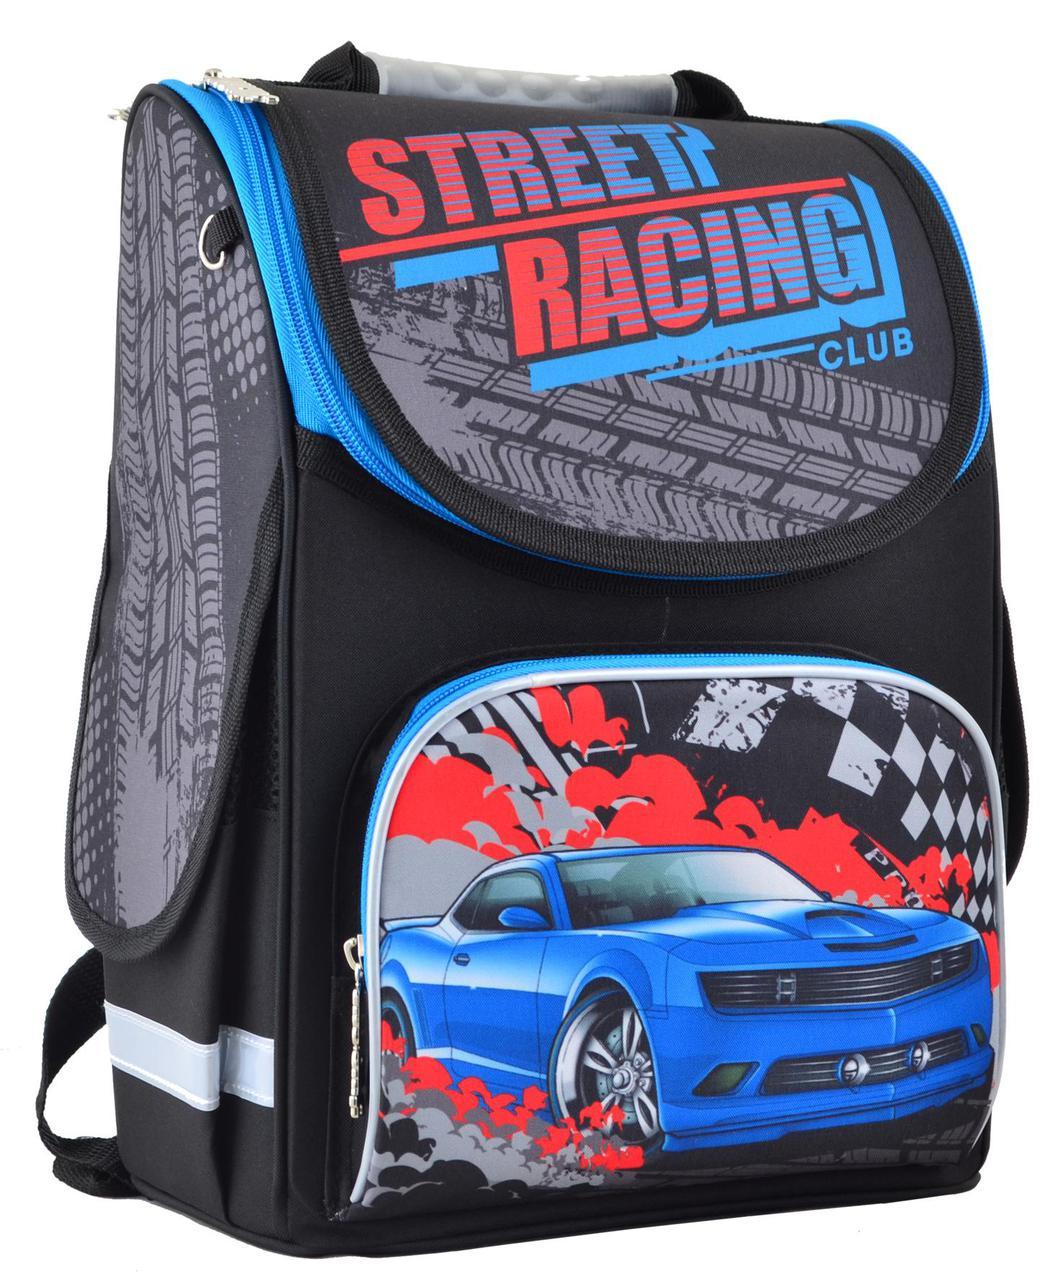 b98f0d020b57 Рюкзак каркасный 1 вересня Smart PG-11 Street racing 554515, 1 ...